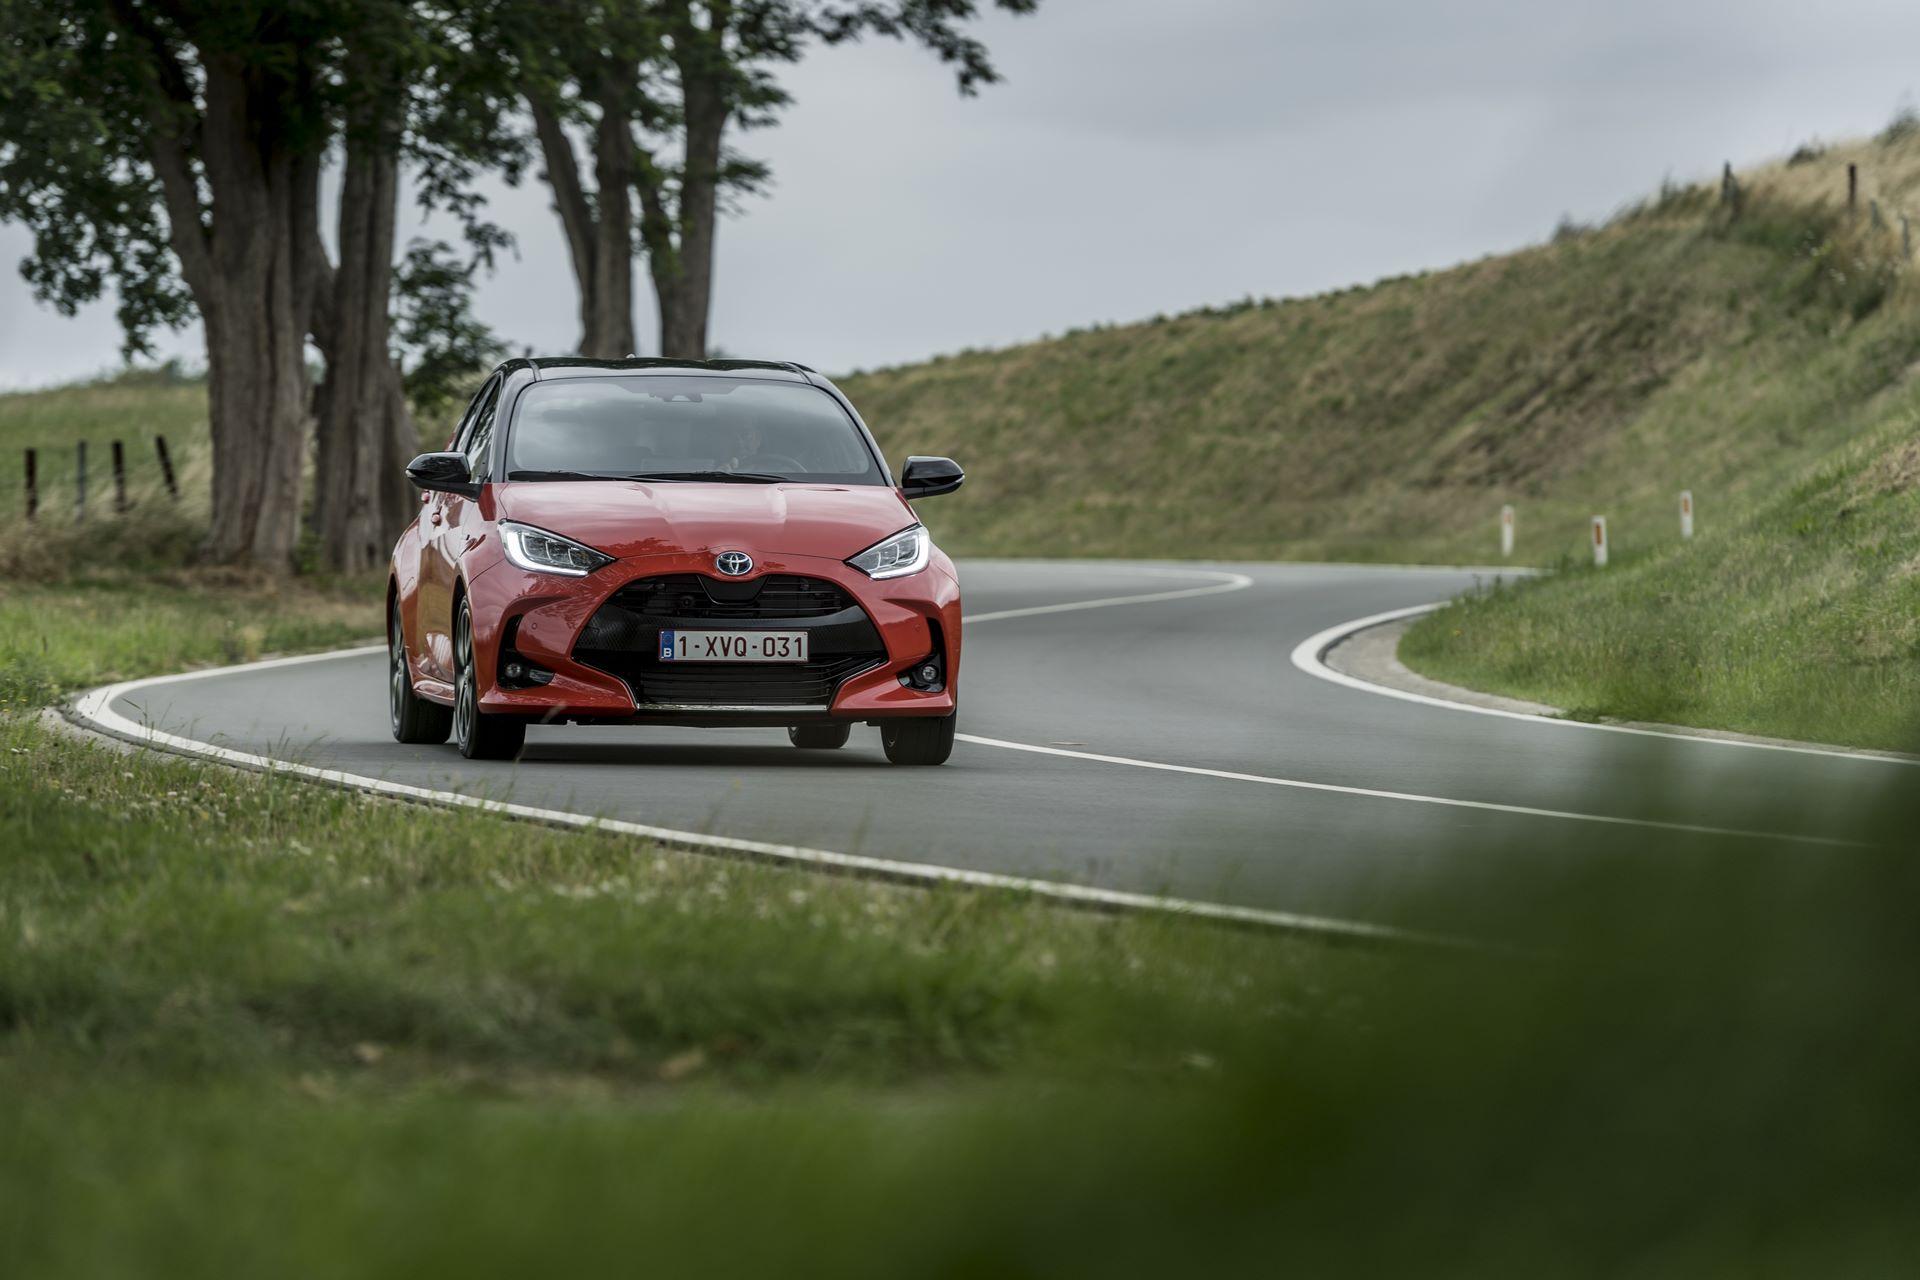 Toyota-Yaris-2020-65